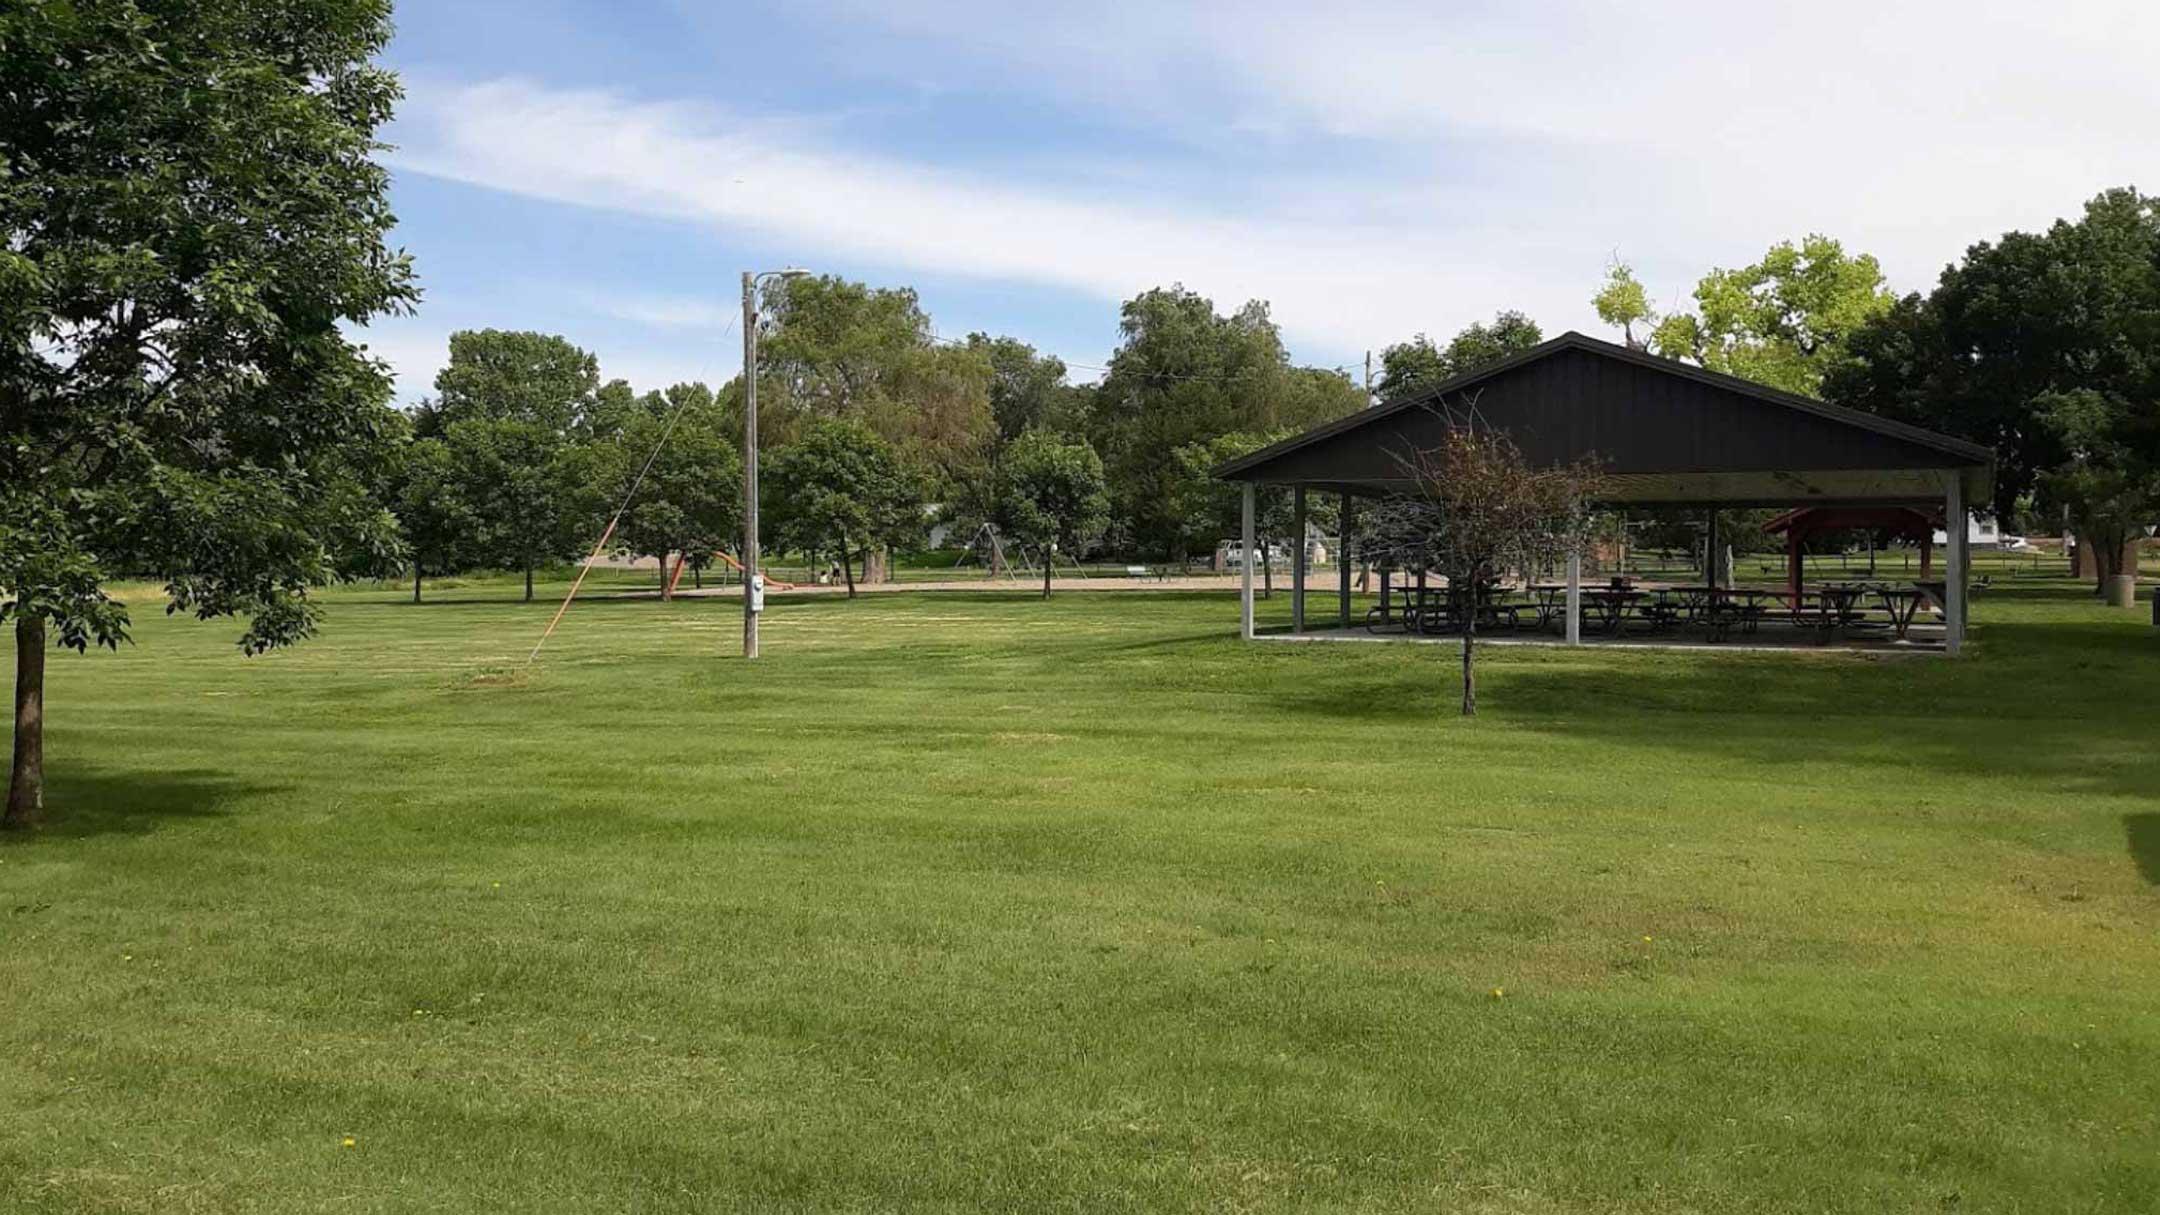 Park in Oacoma South Dakota